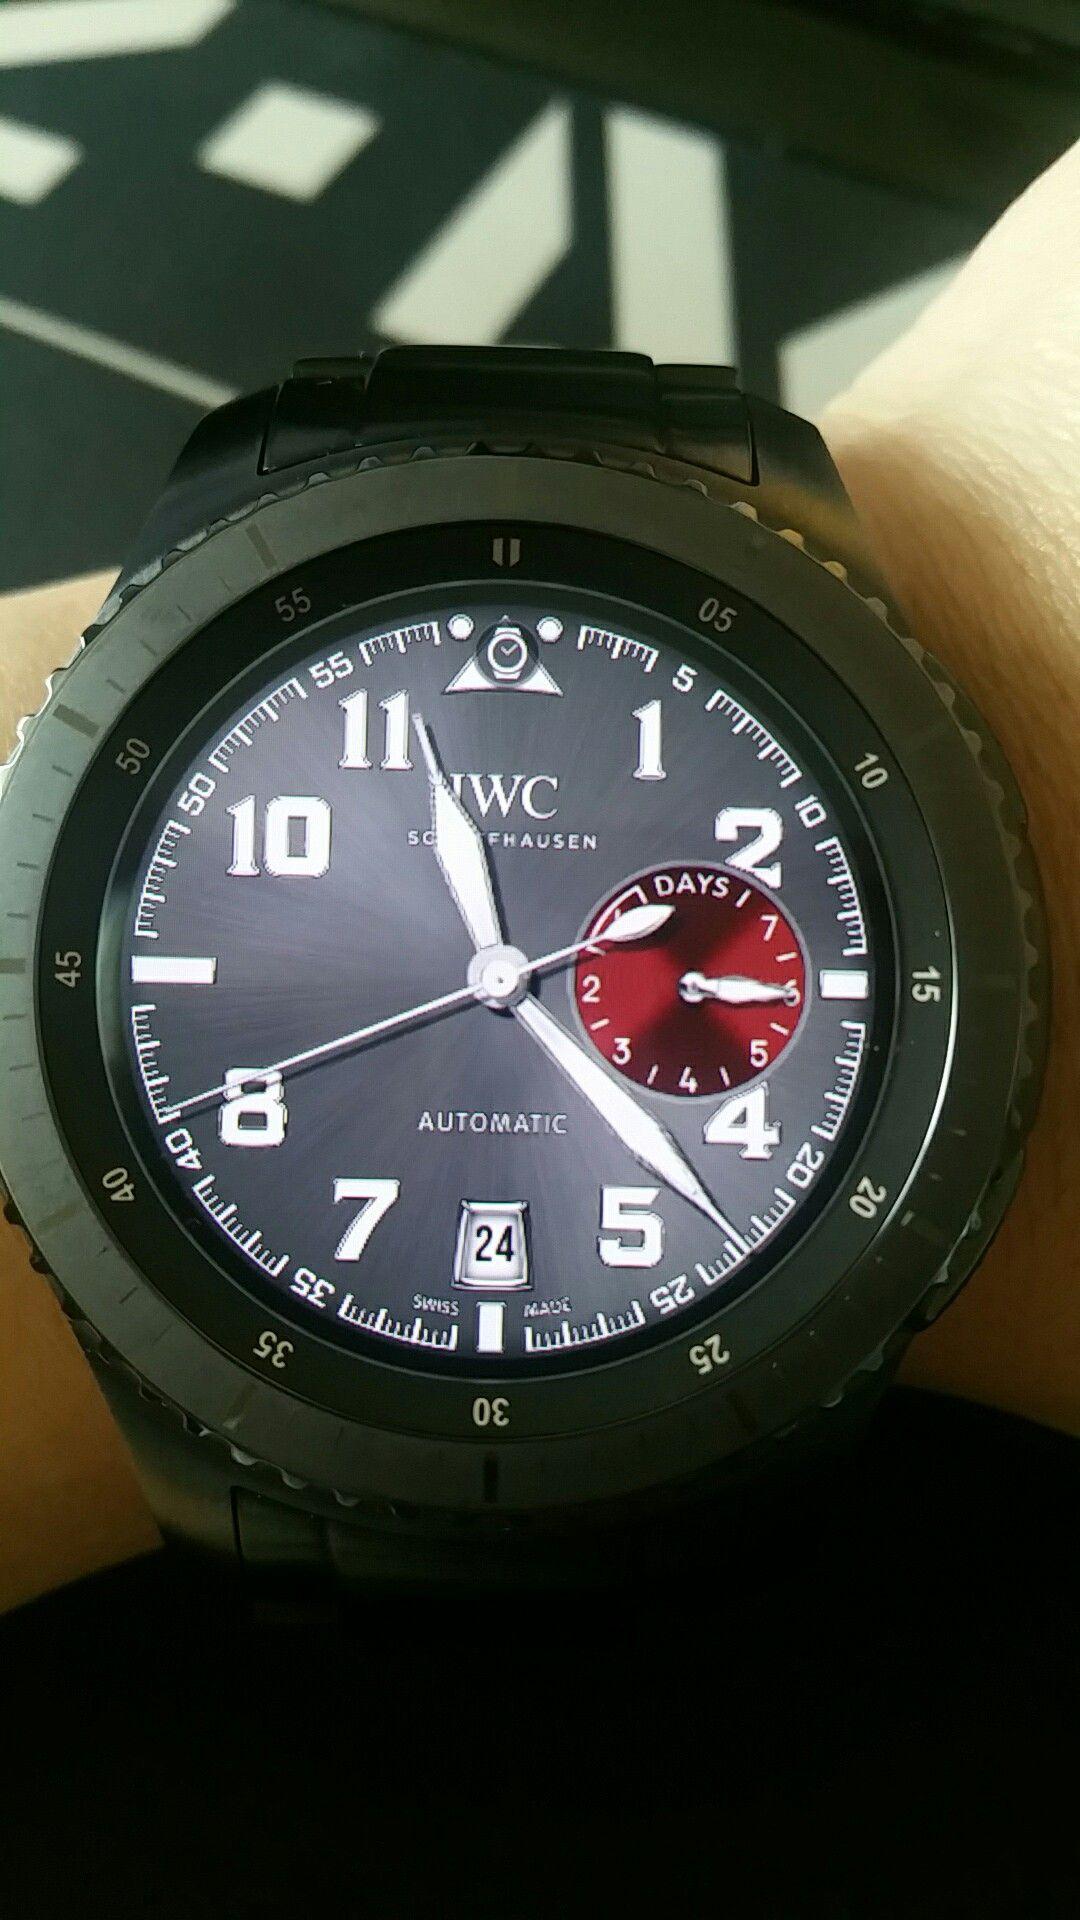 Iwc watch face